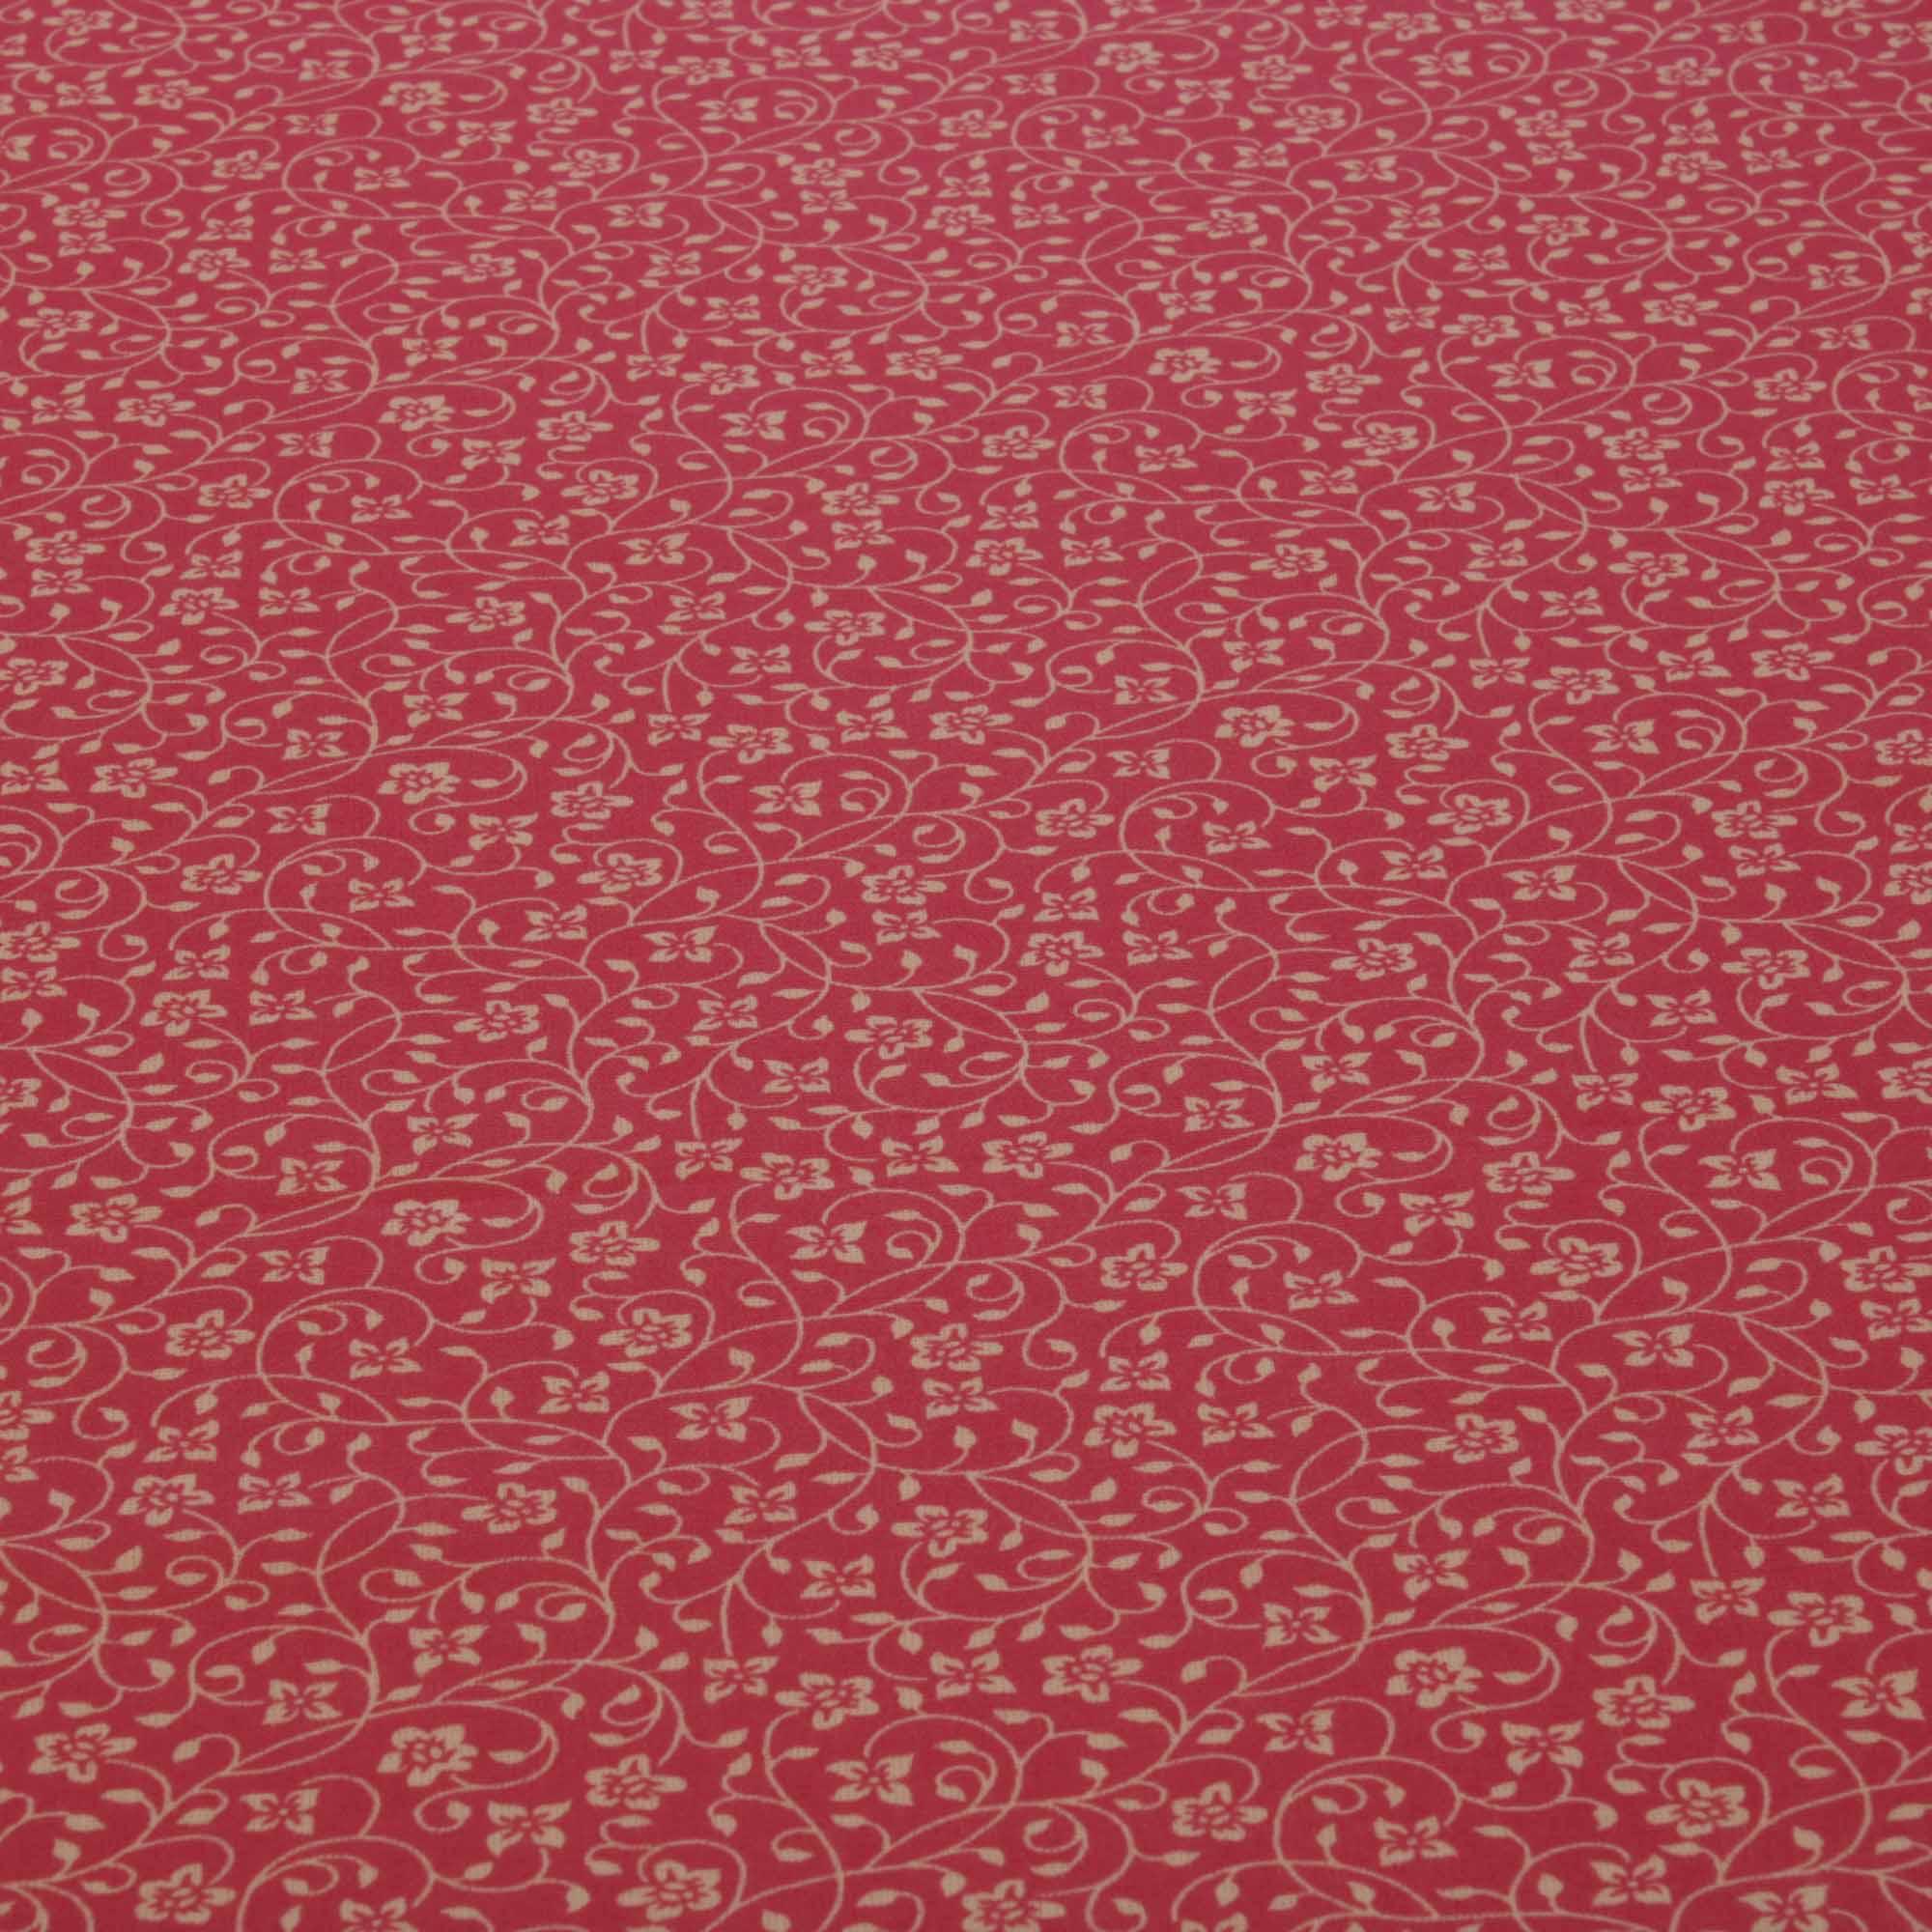 Tecido tricoline ramos flores 1,40 m largura rosa